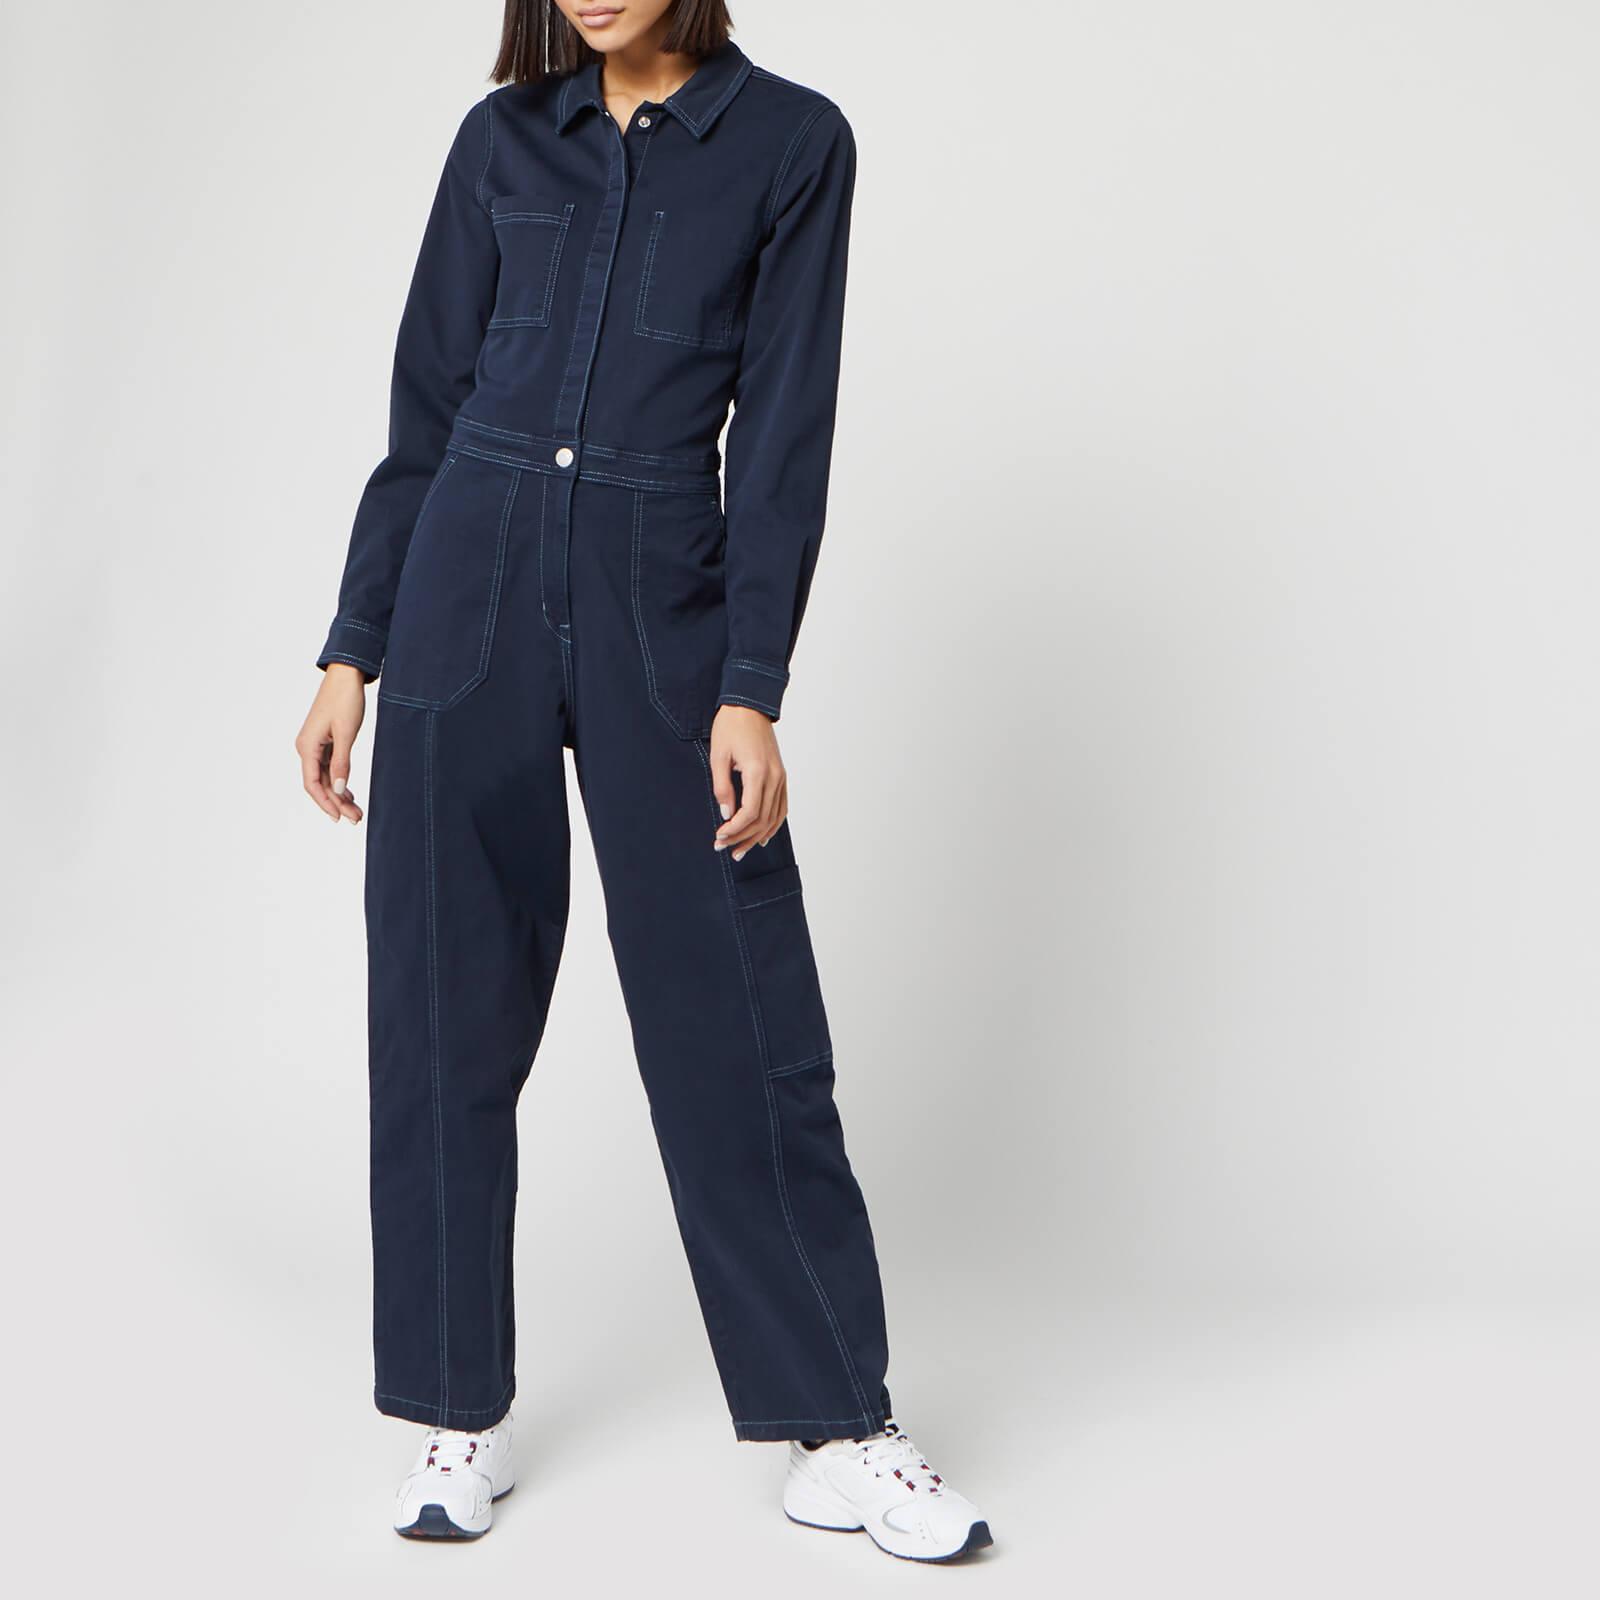 Tommy Jeans Women's Regular Jumpsuit - Black Iris - S